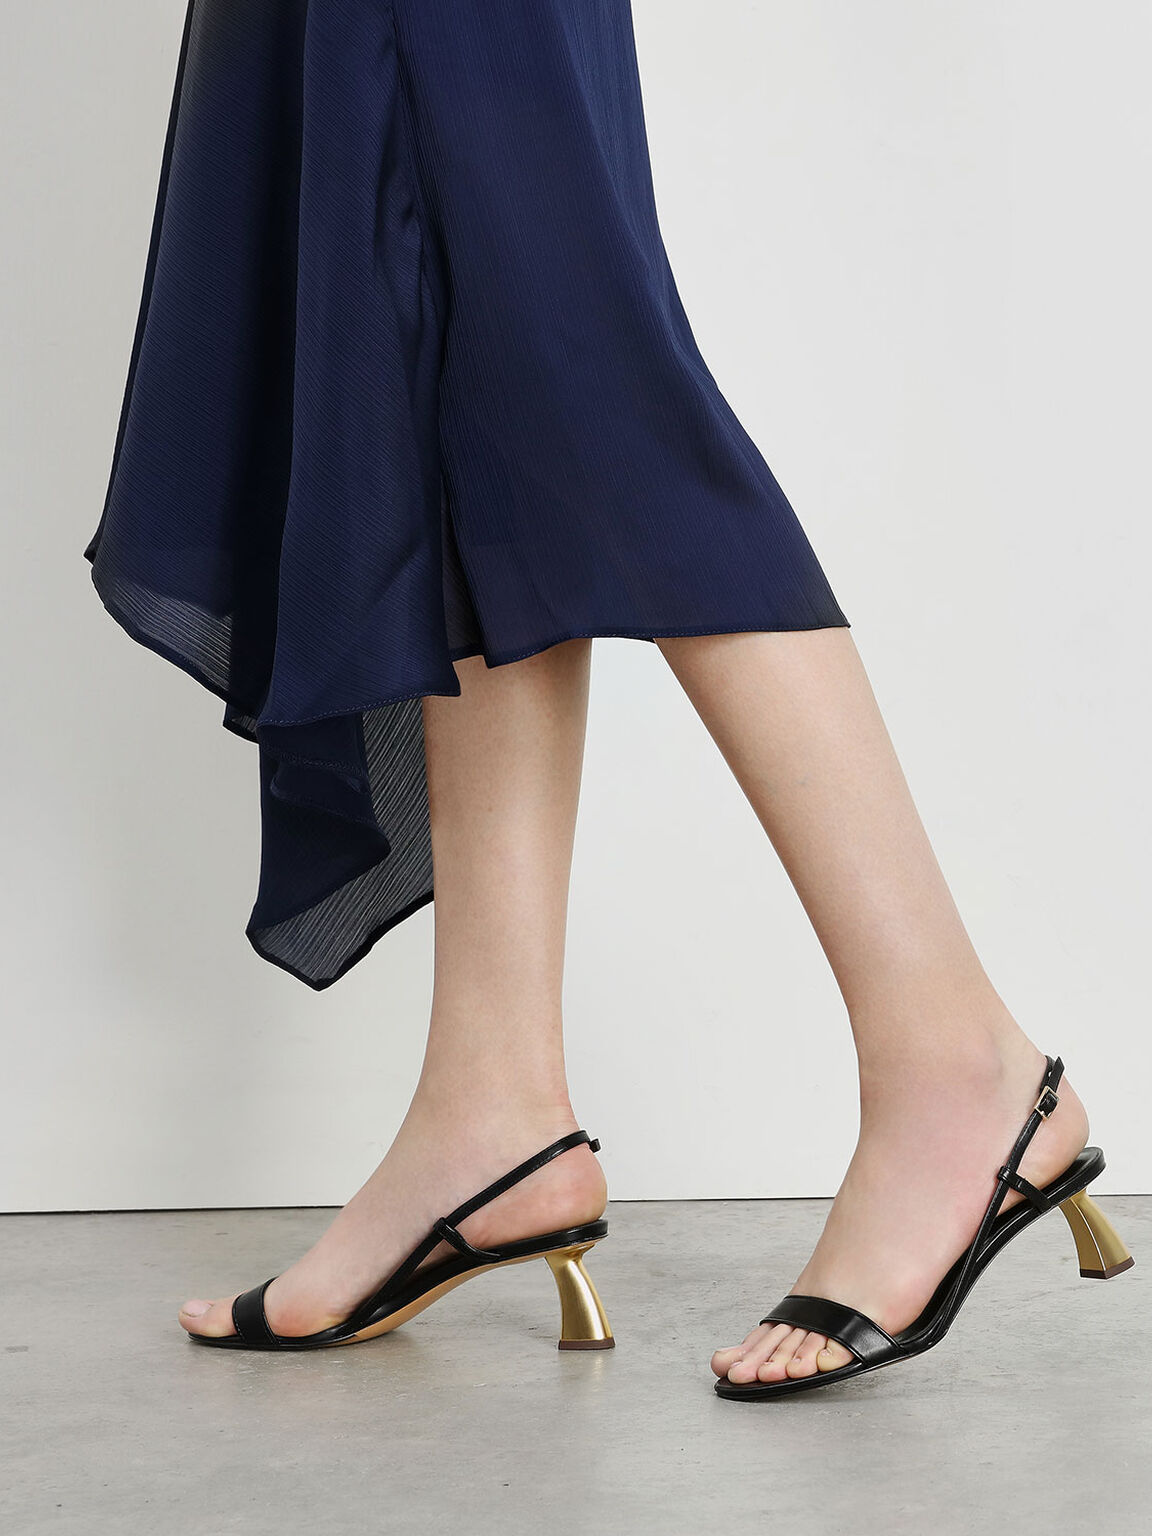 Sculptural Heel Strappy Sandals, Black, hi-res